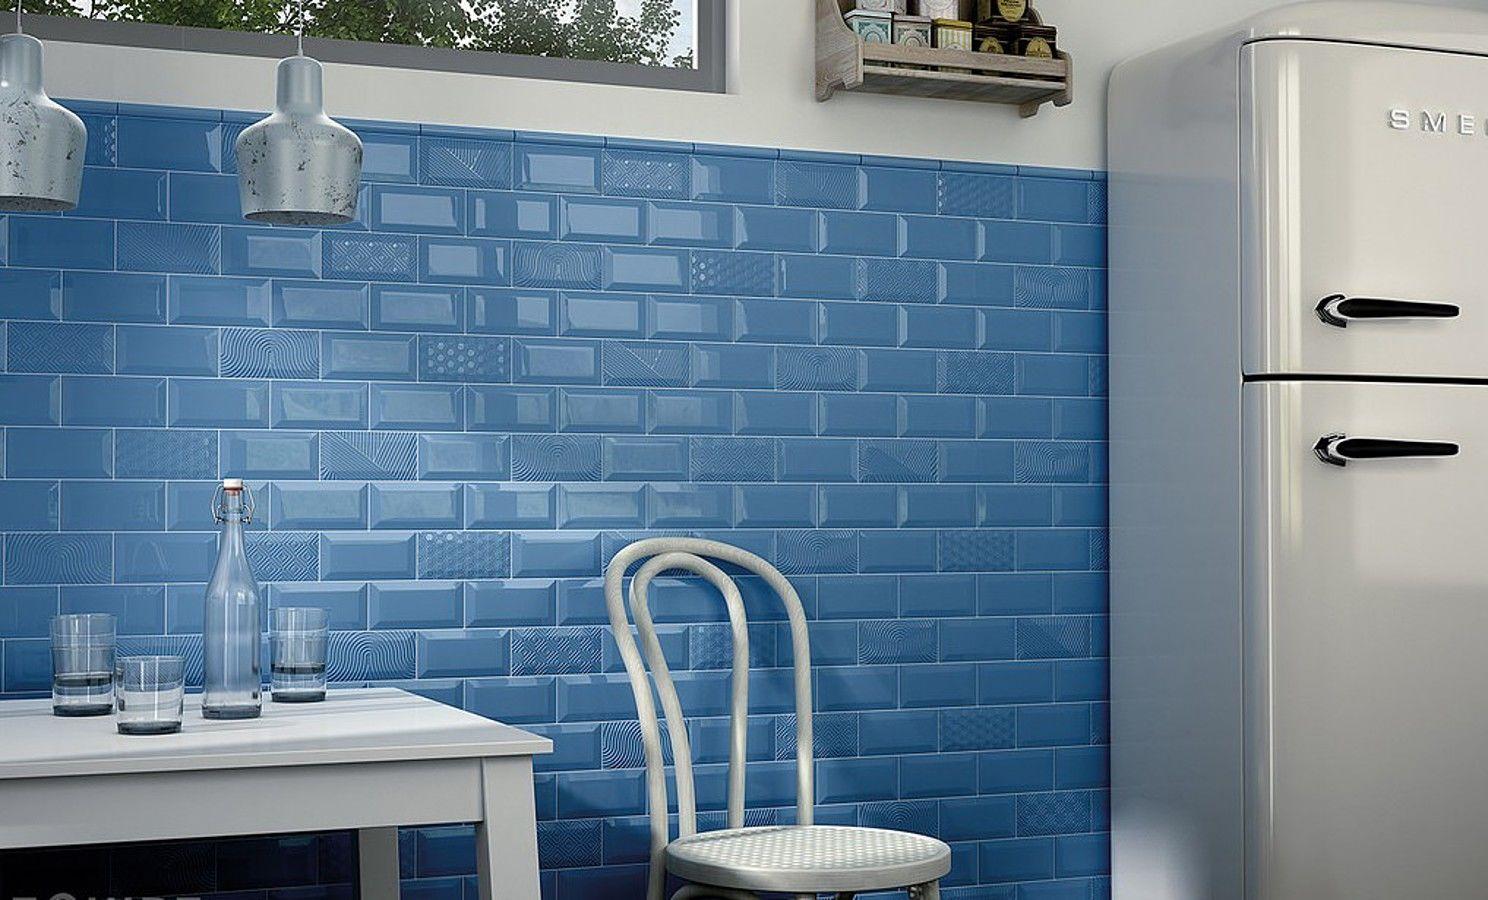 Голубая мозаика в стиле ретро